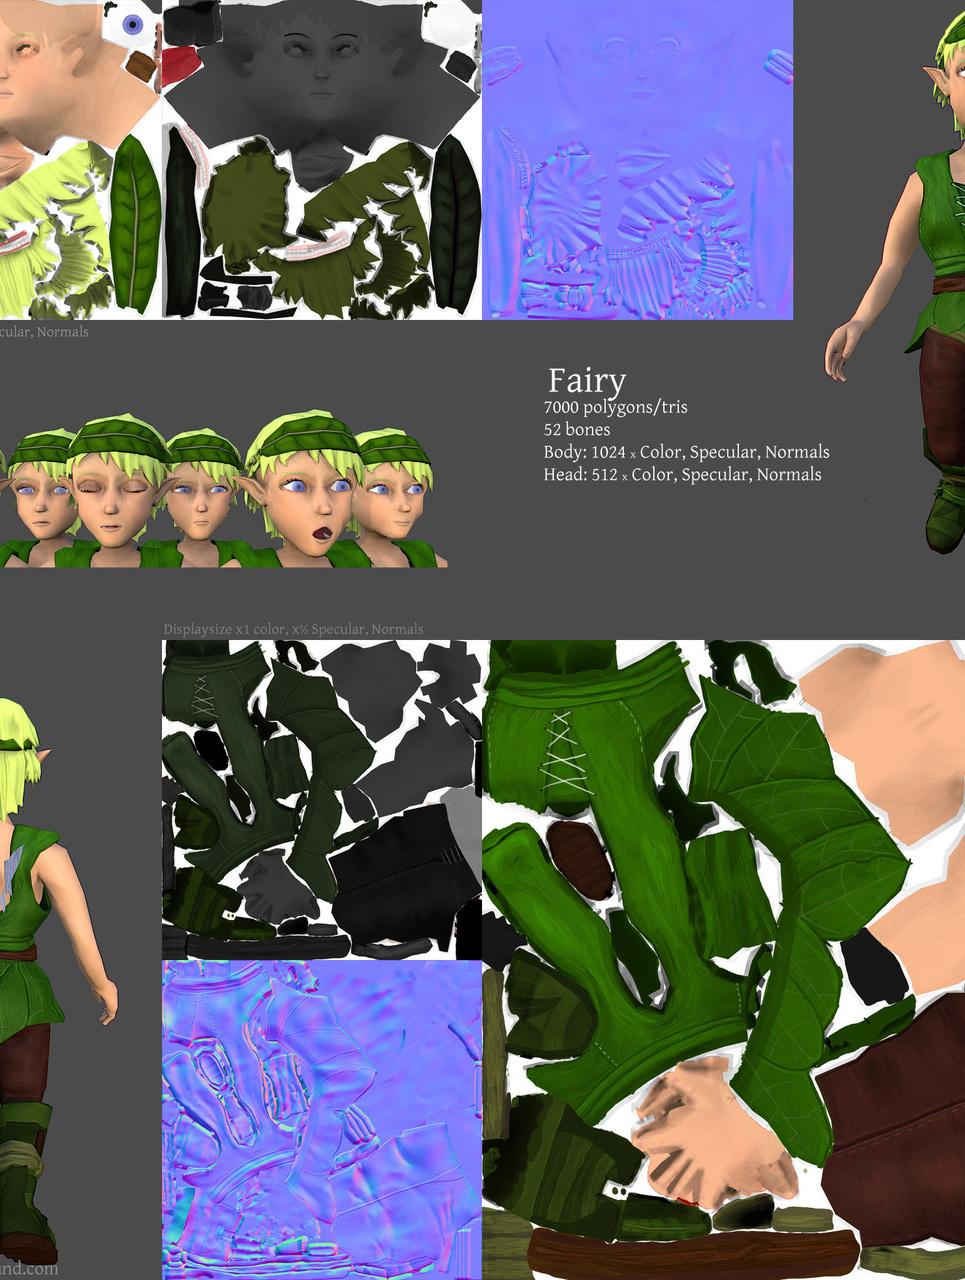 Fairy maps show